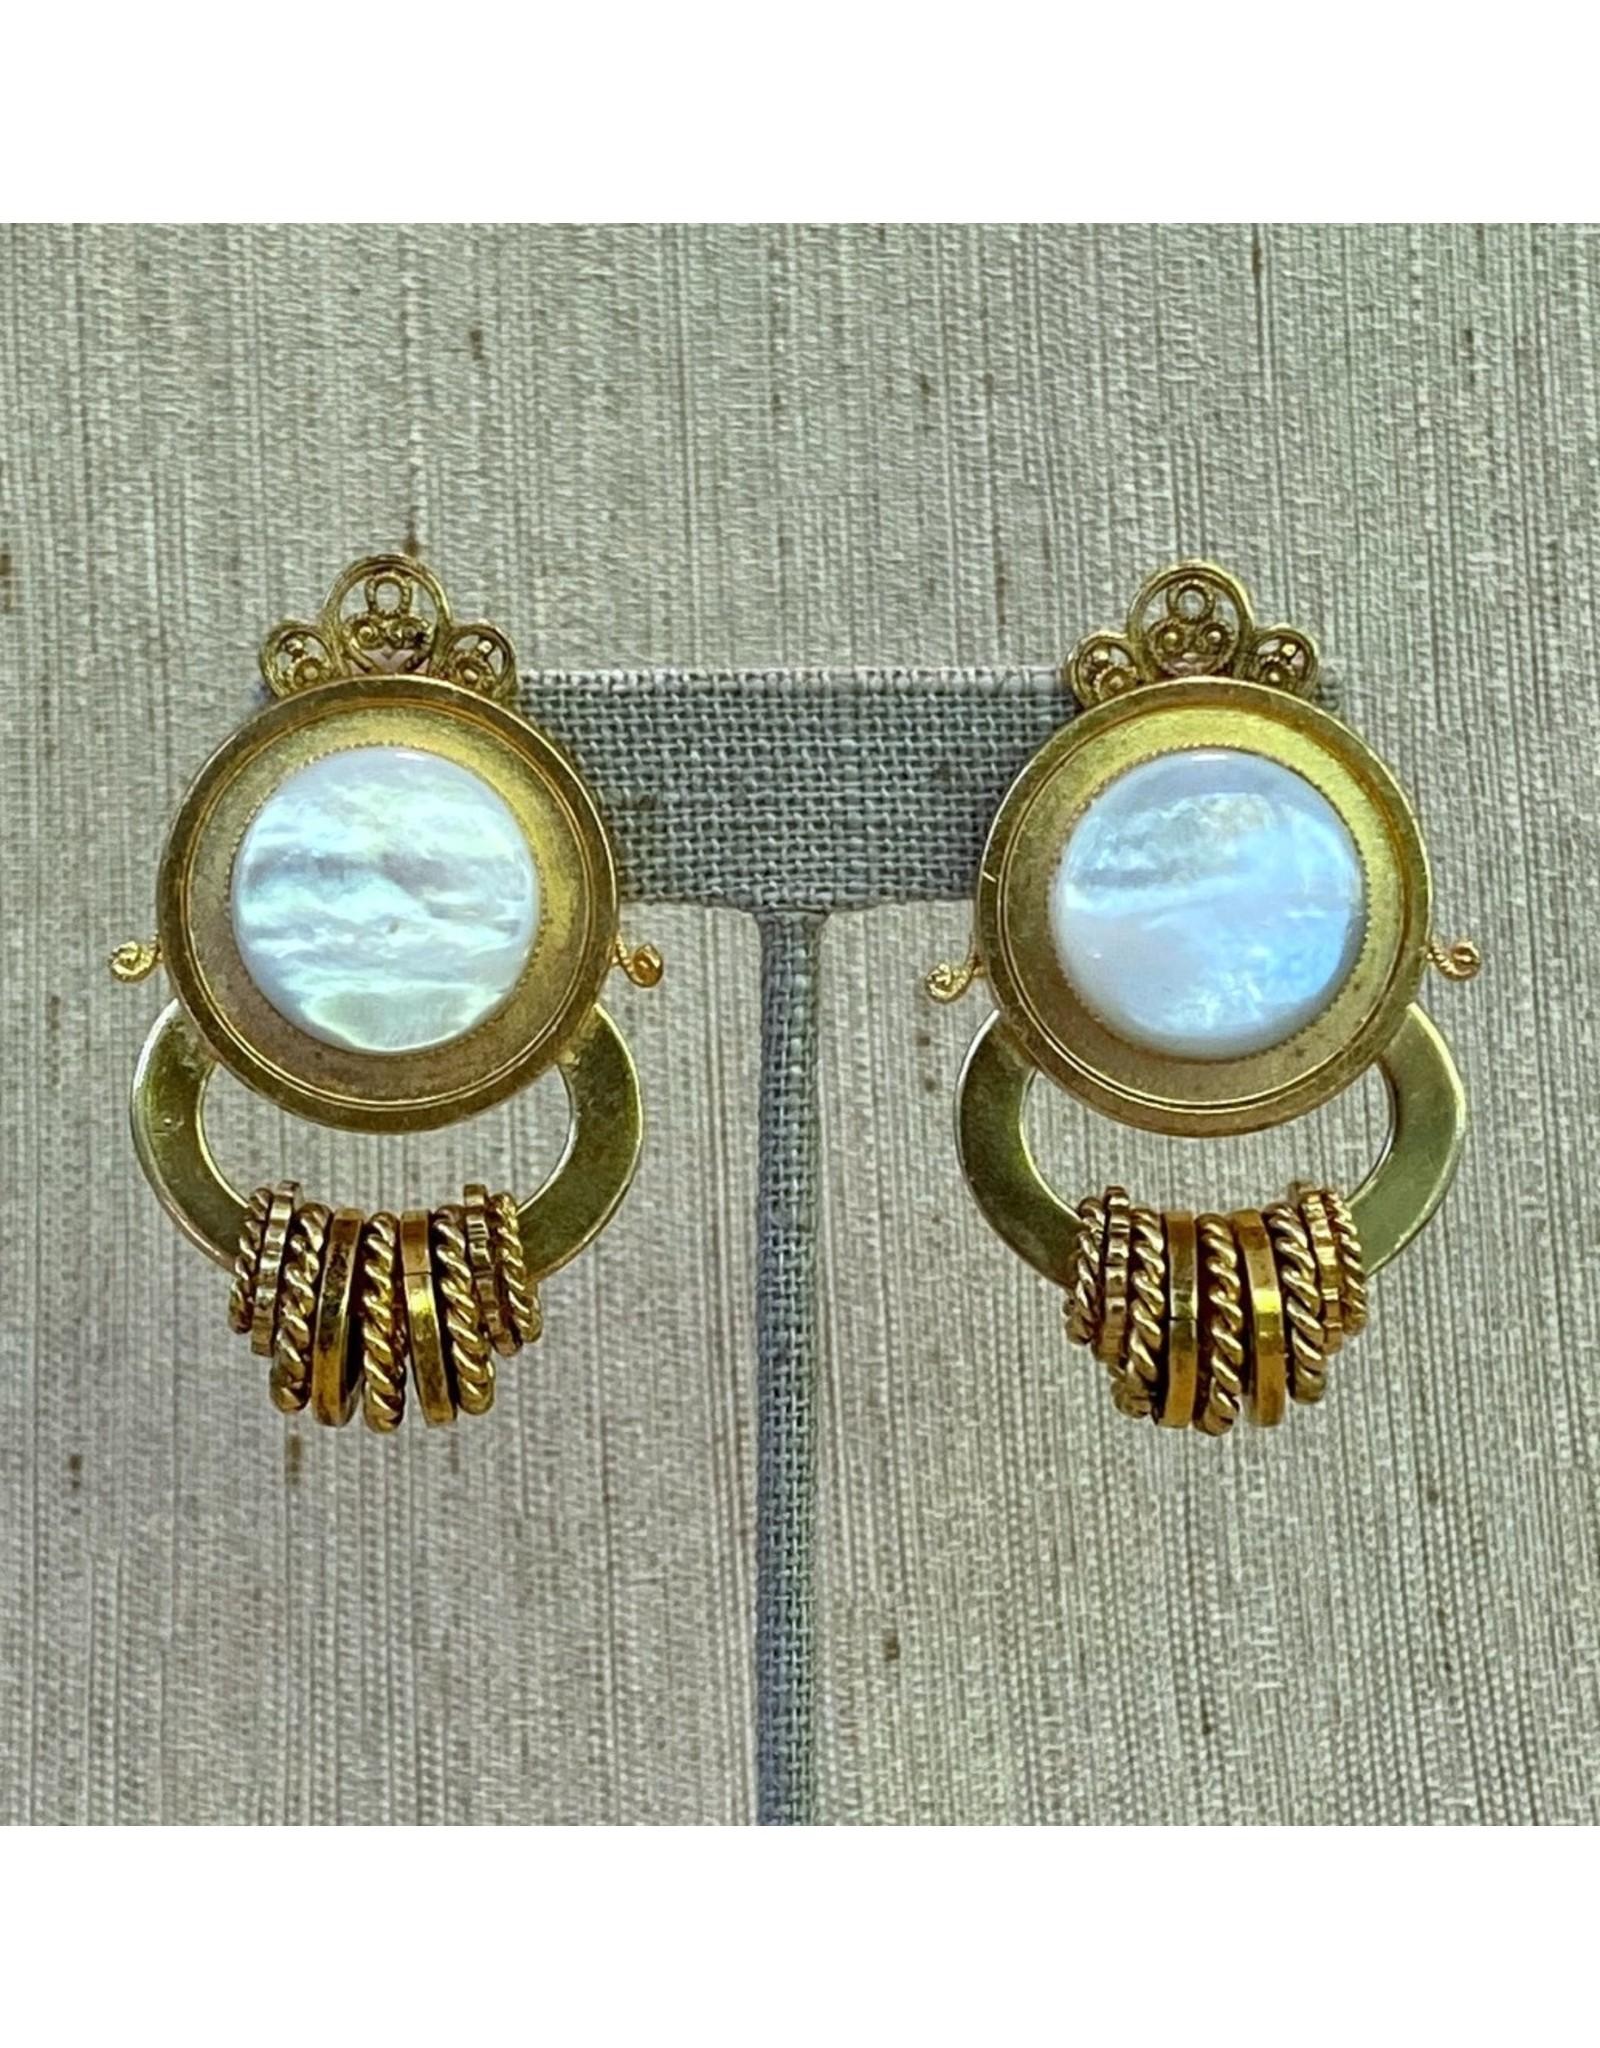 Jean Louis Blinn blin/6922/gold/white/ant/circle